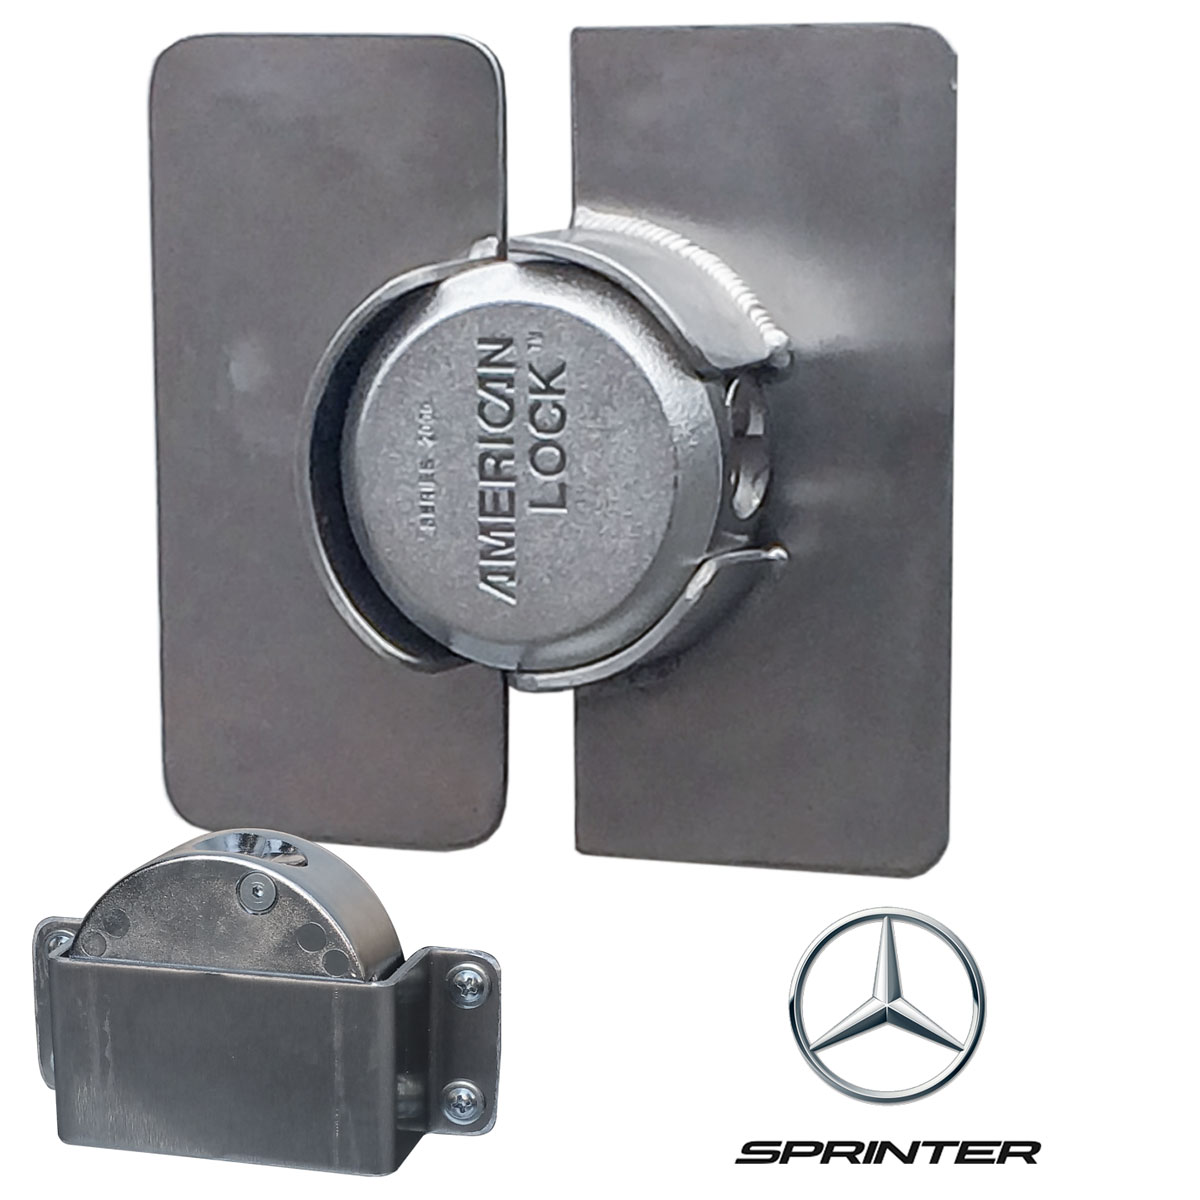 2007+ SprinterPuck Lock Kit Sliding DoorSKU: 170002